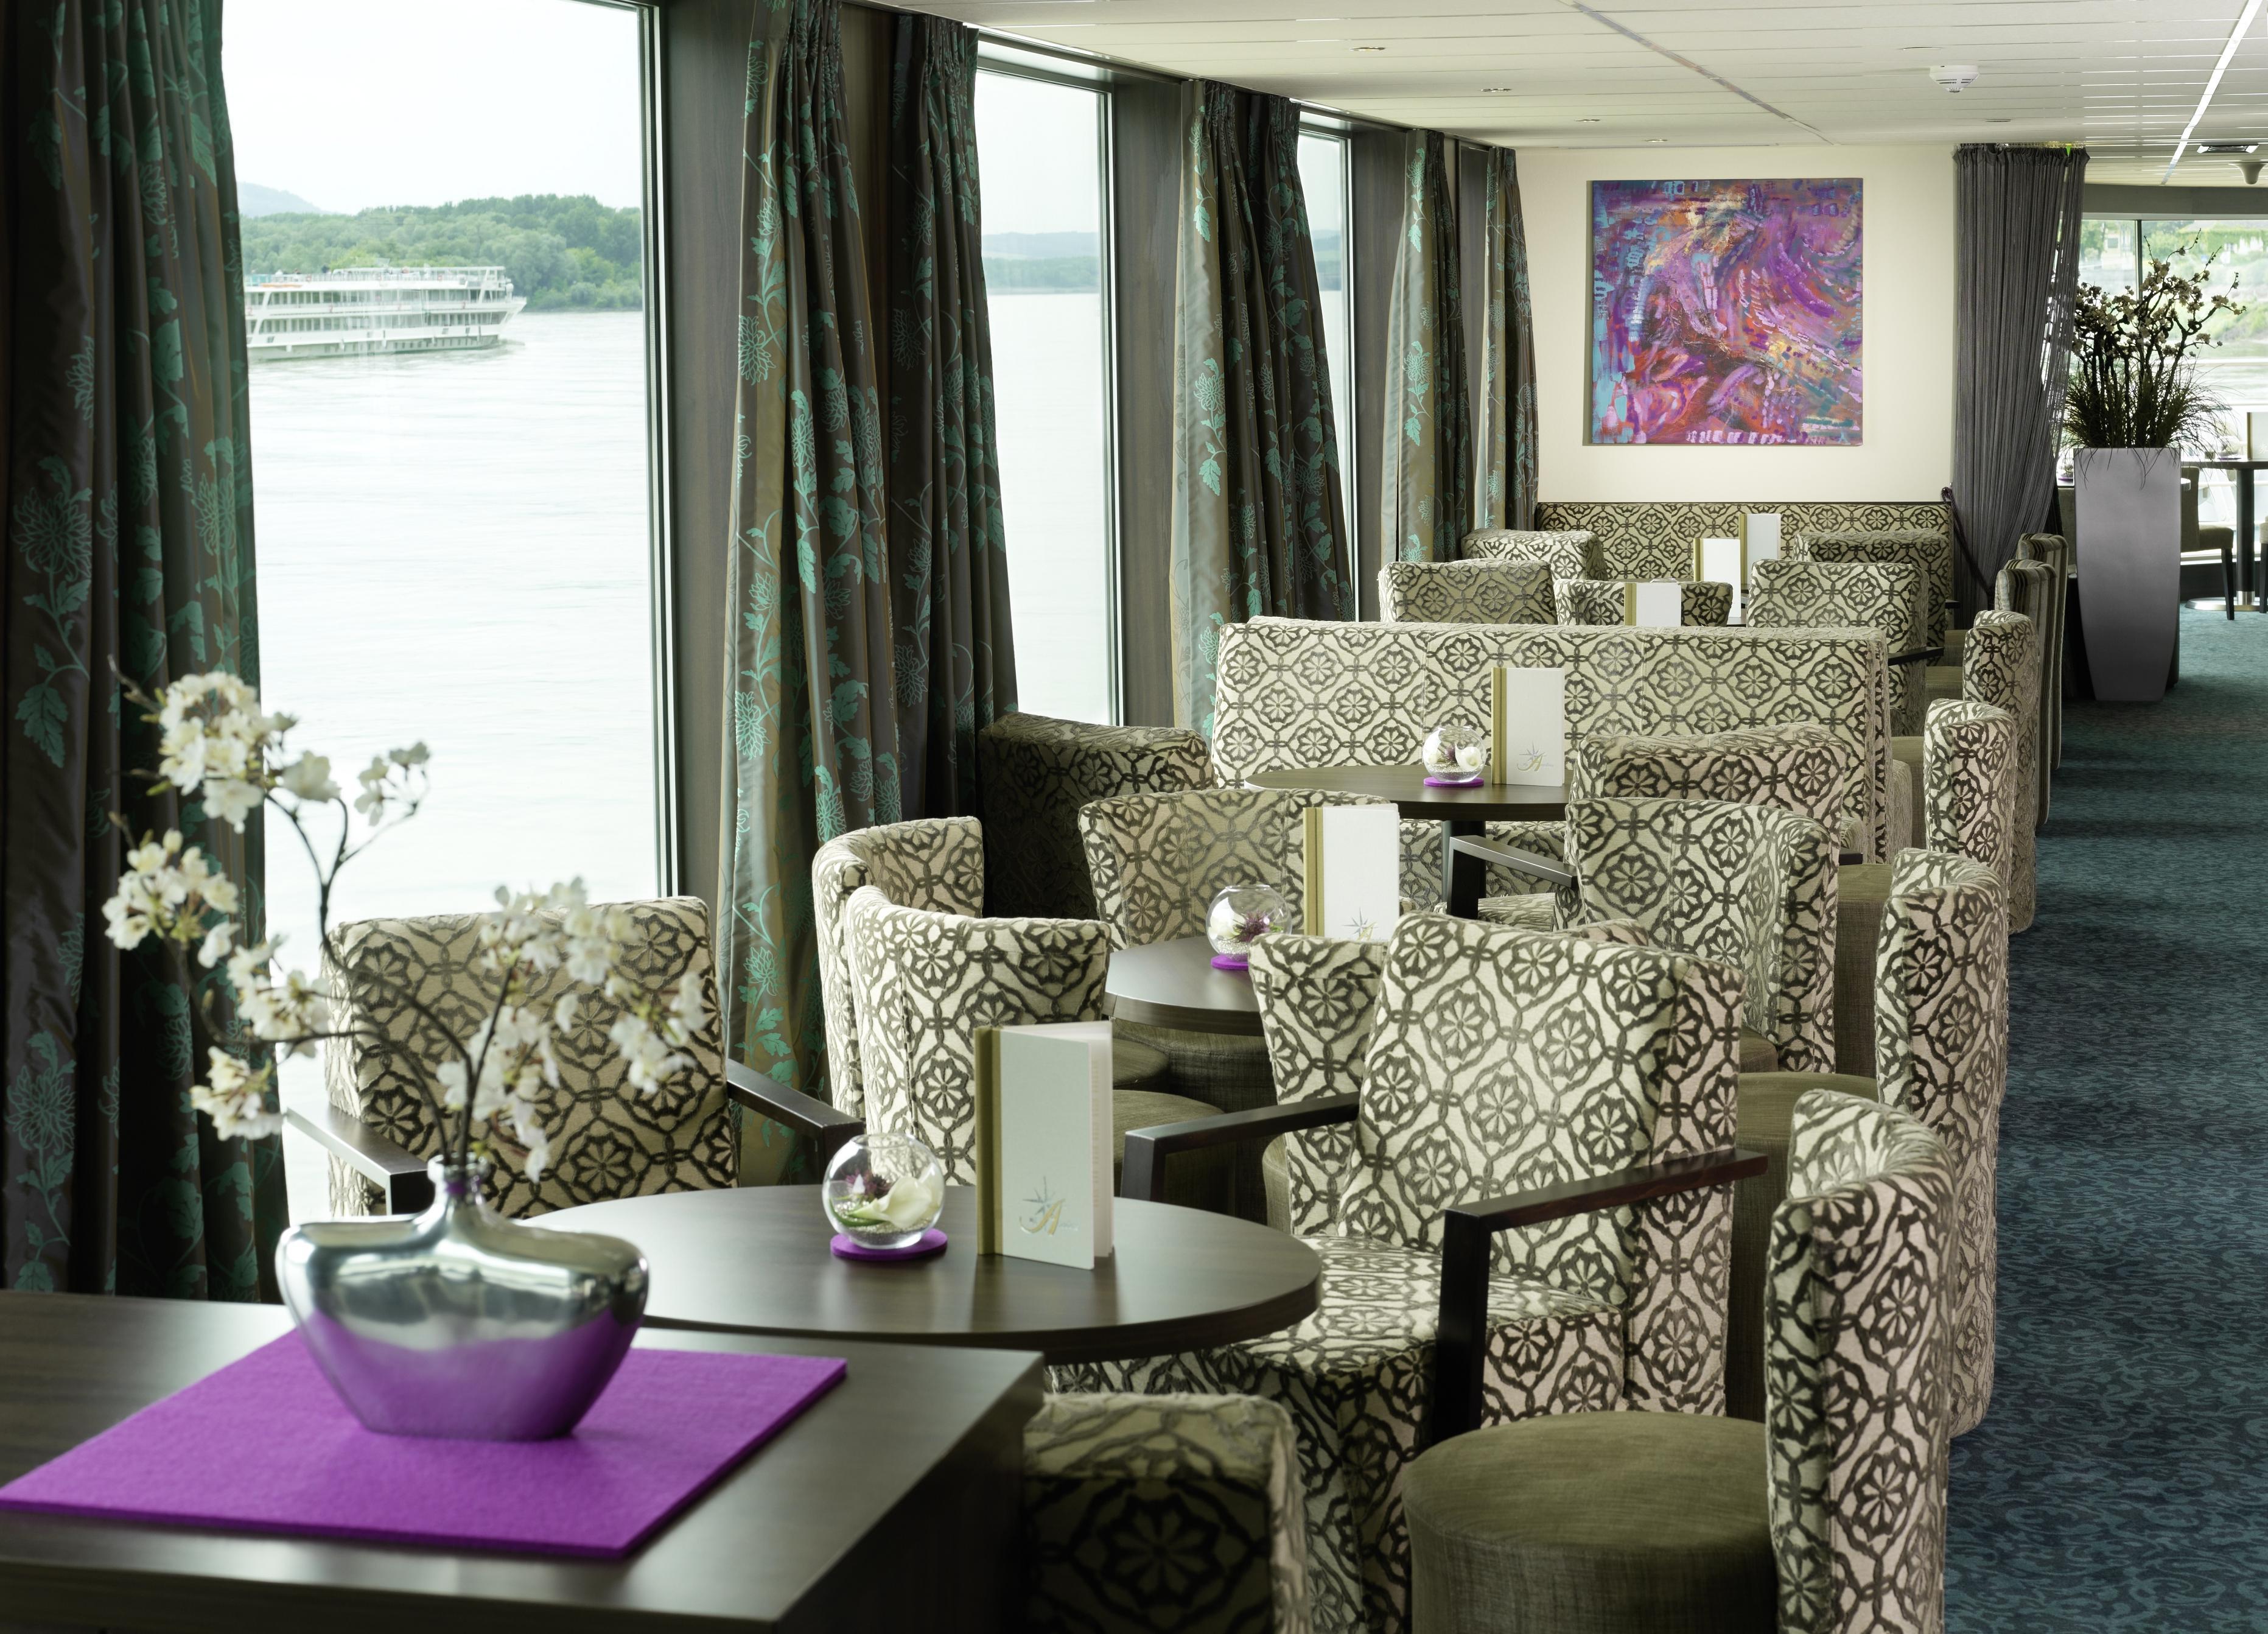 Amadeus River Cruises Amadeus Elegant Interior Panorama Lounge Bar.jpg